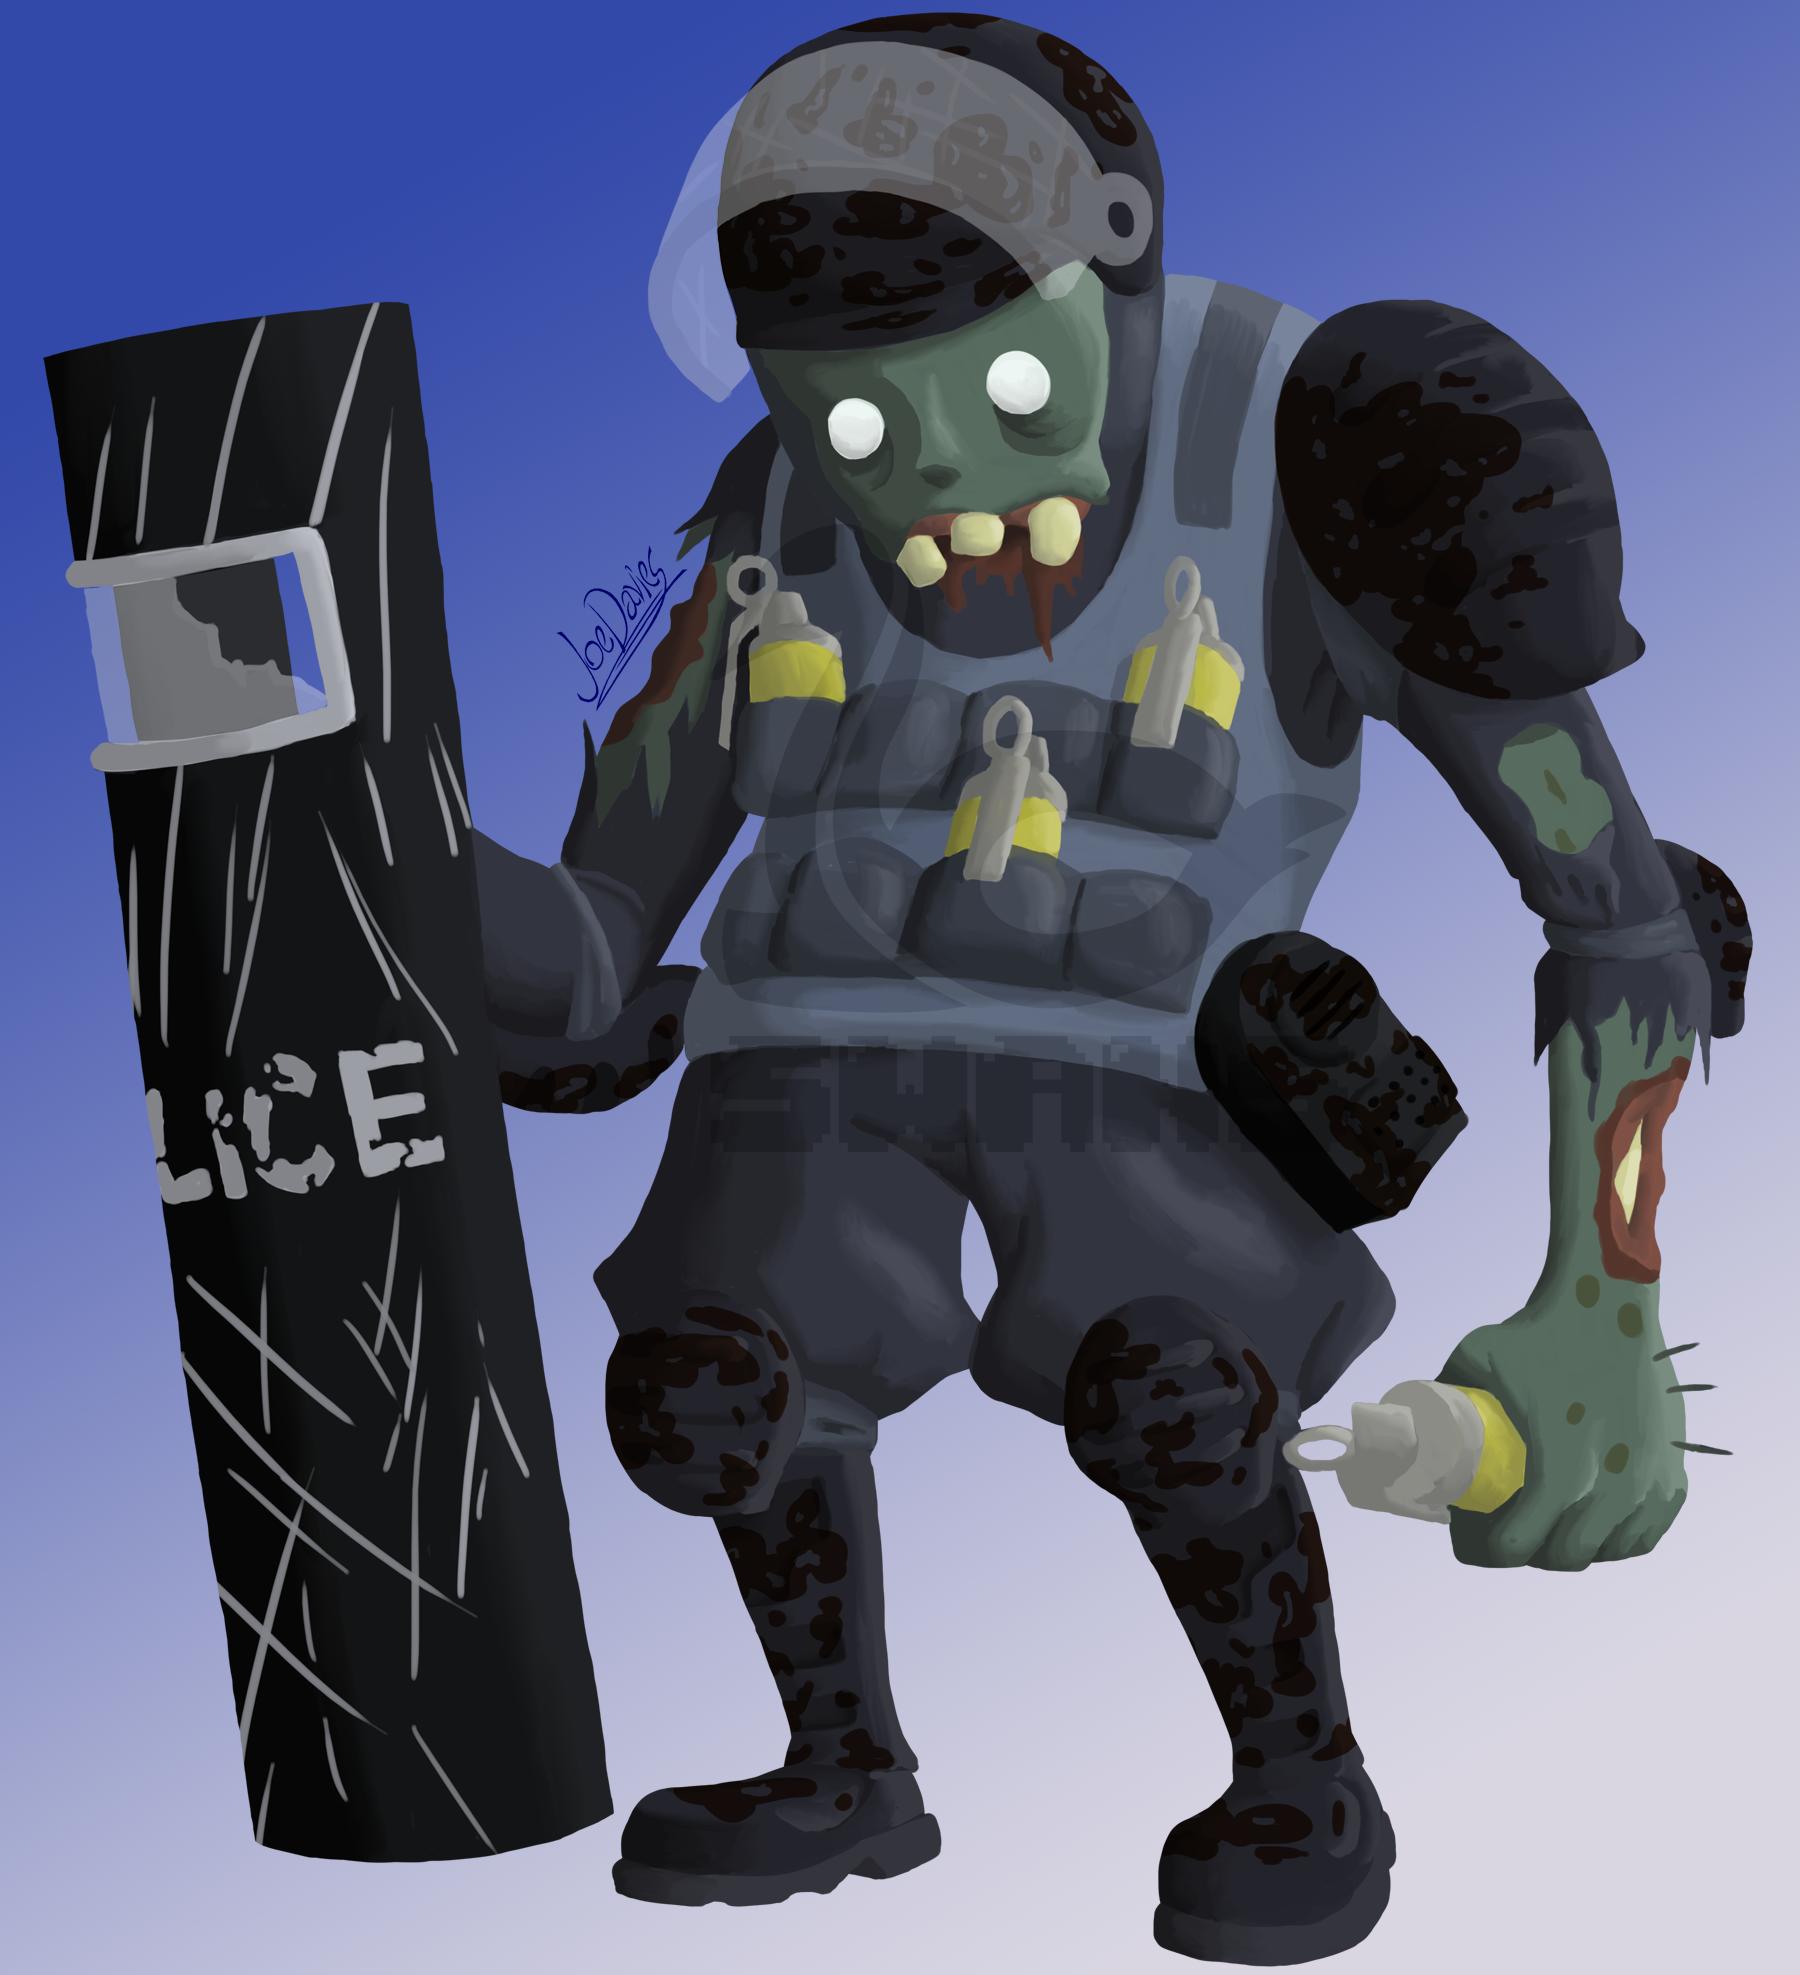 029_Riot_Cop_Zombie